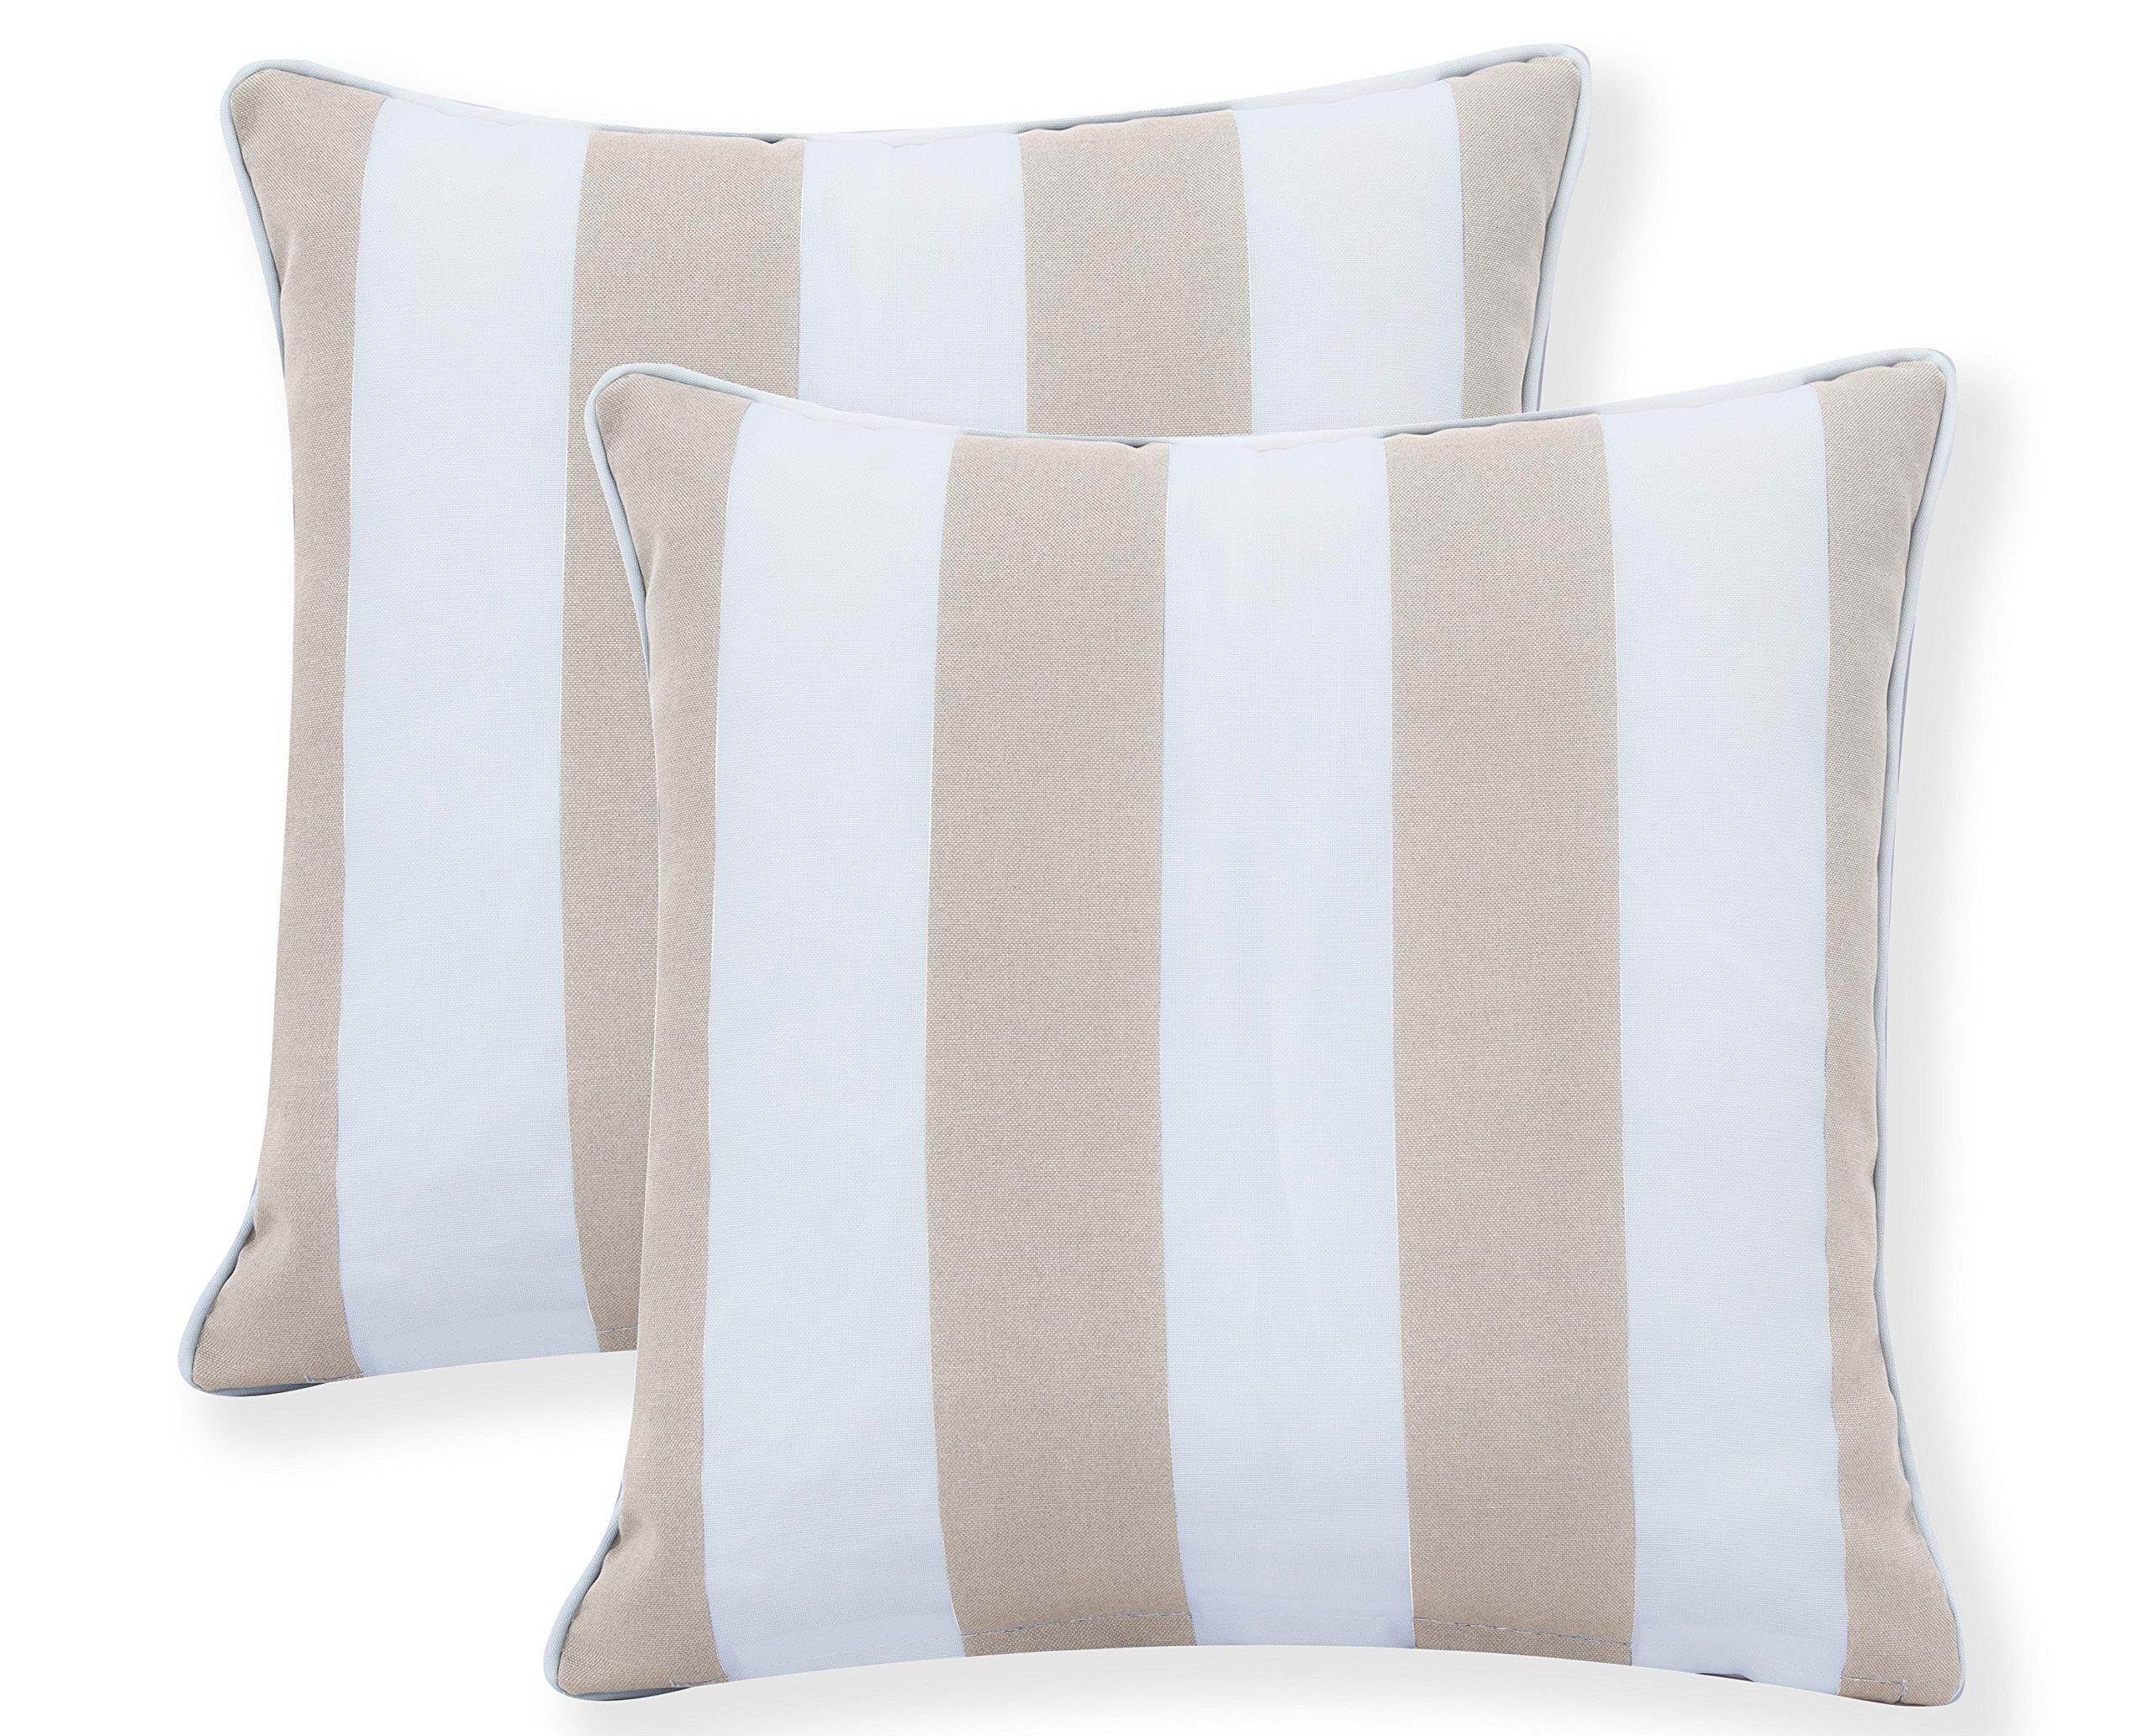 Decor Venue Water Resistant Indoor/Outdoor Square Patio Decorative Stripe Throw Pillow Cushion - Set of 2-18'' x 18'' - Beige